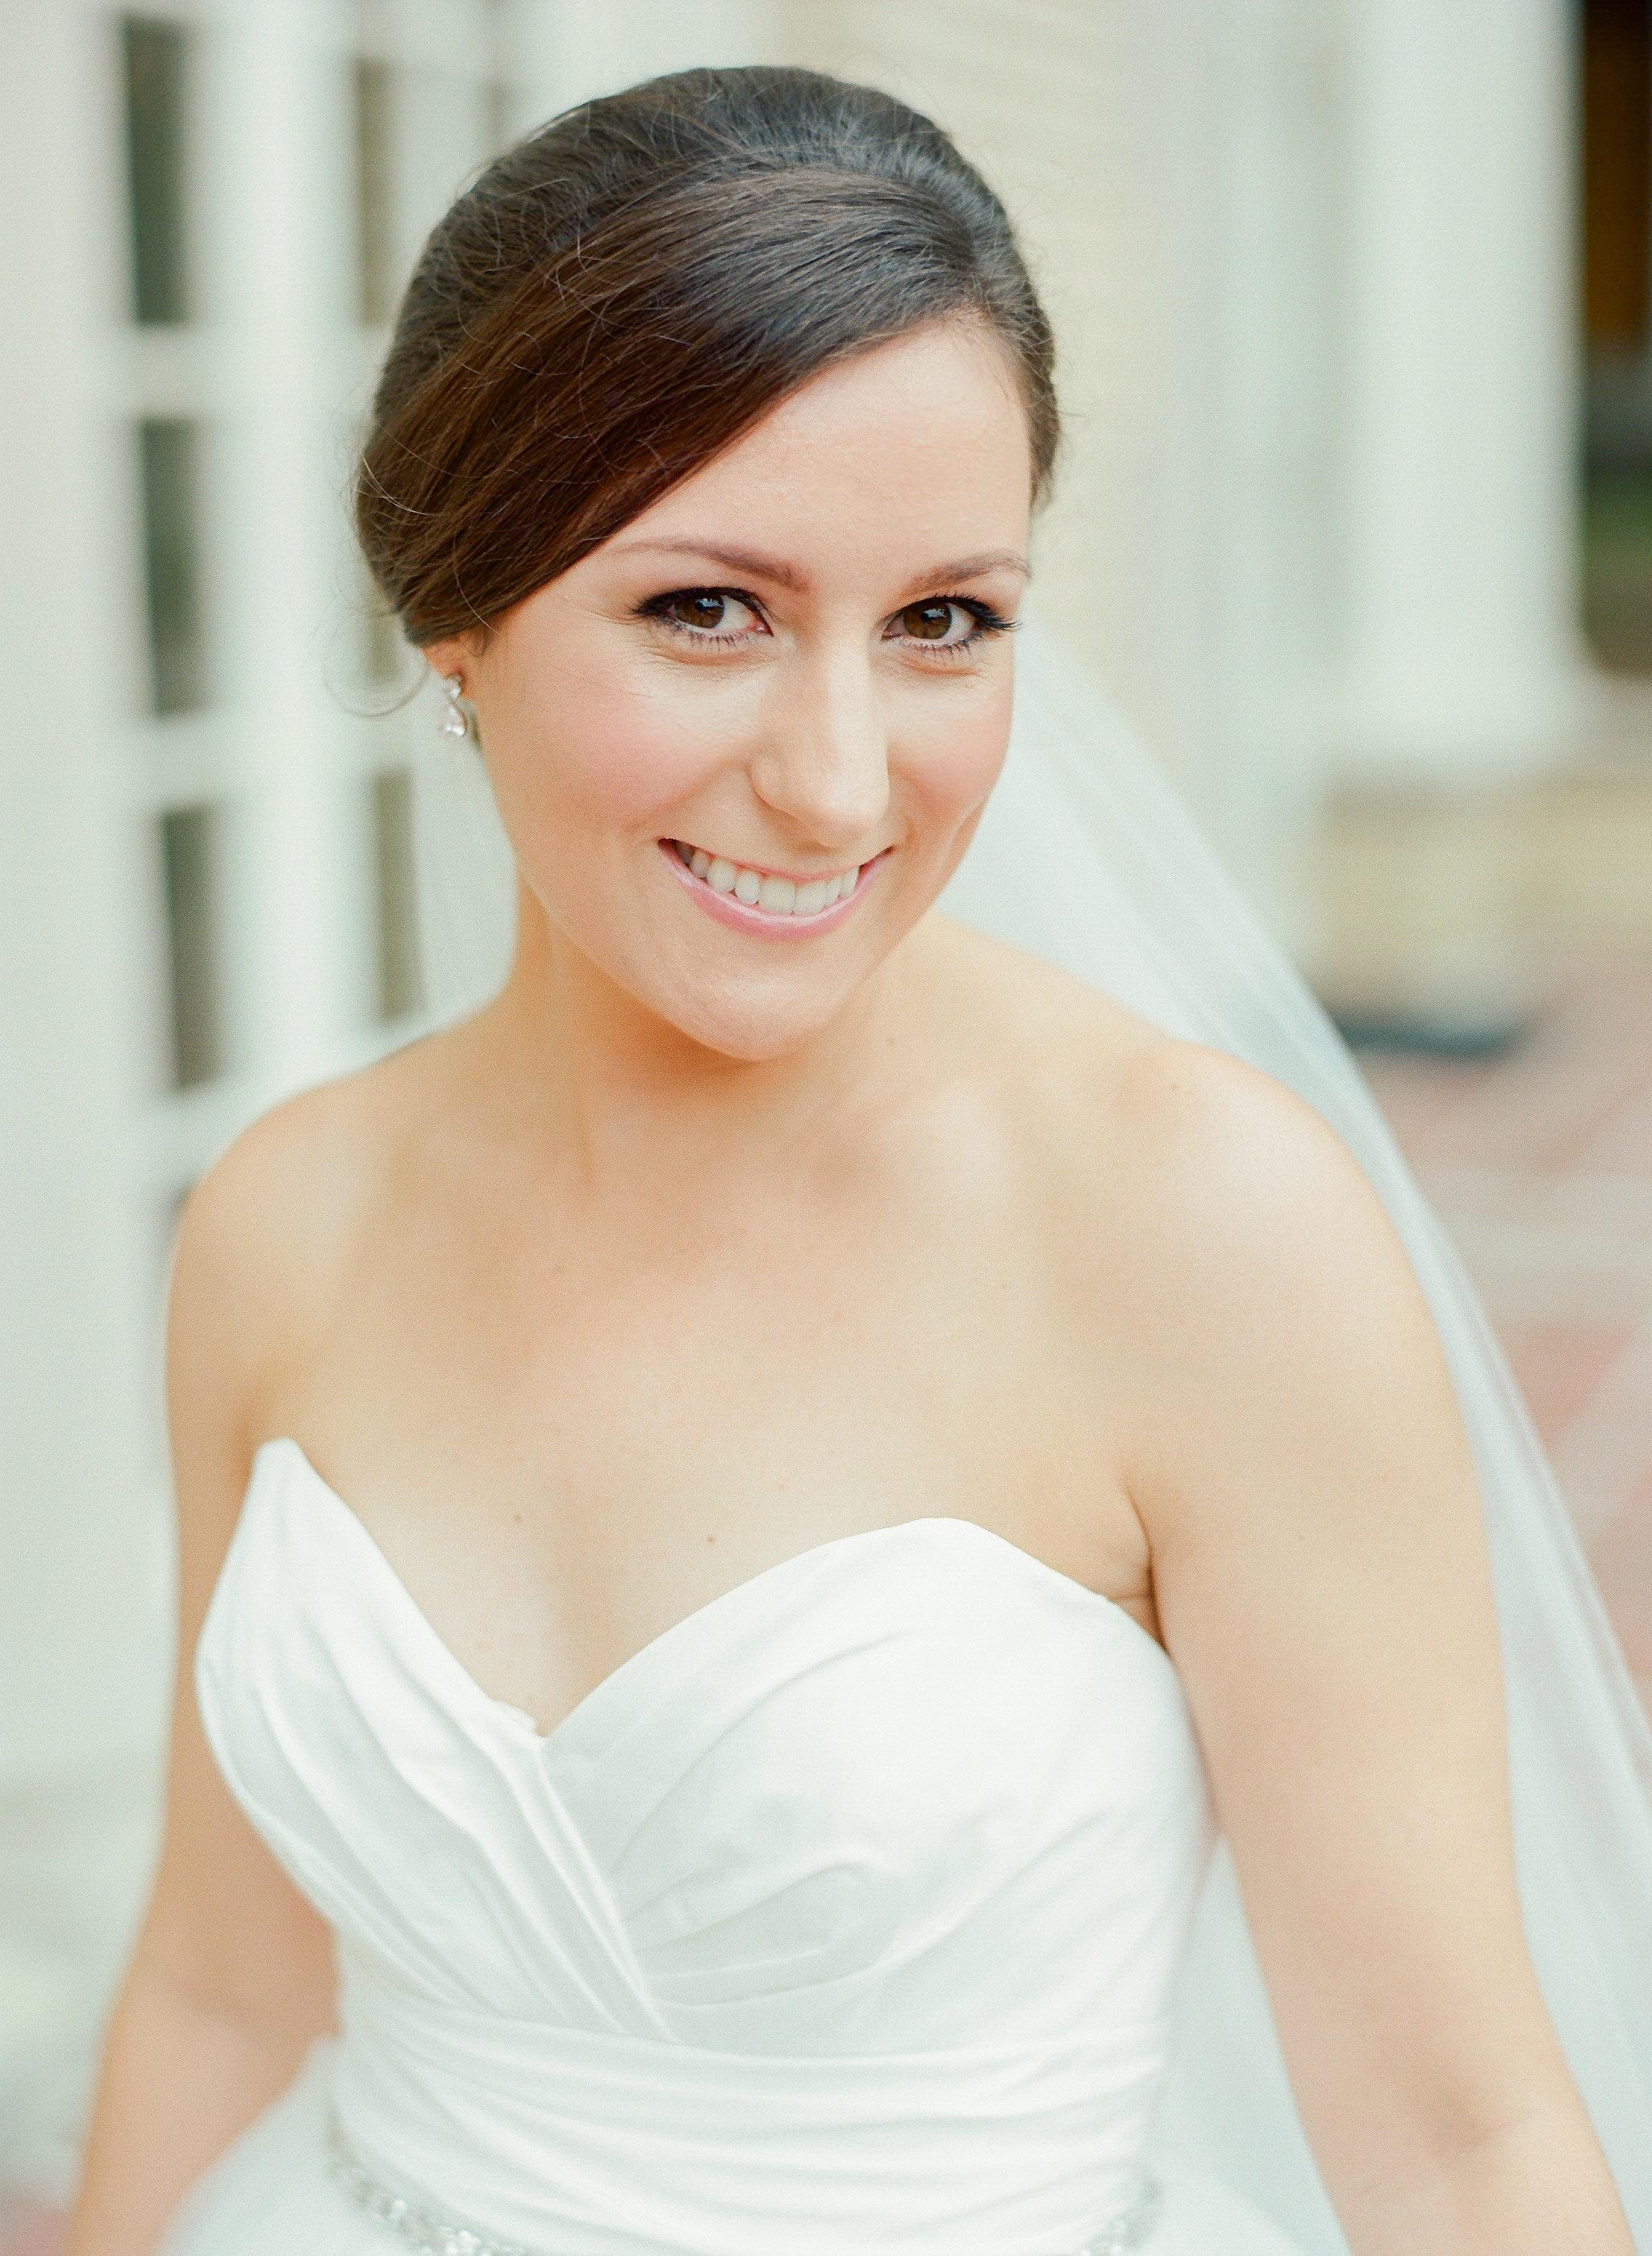 North-Carolina-Bridal-Photographer-Rebecca-3.jpg